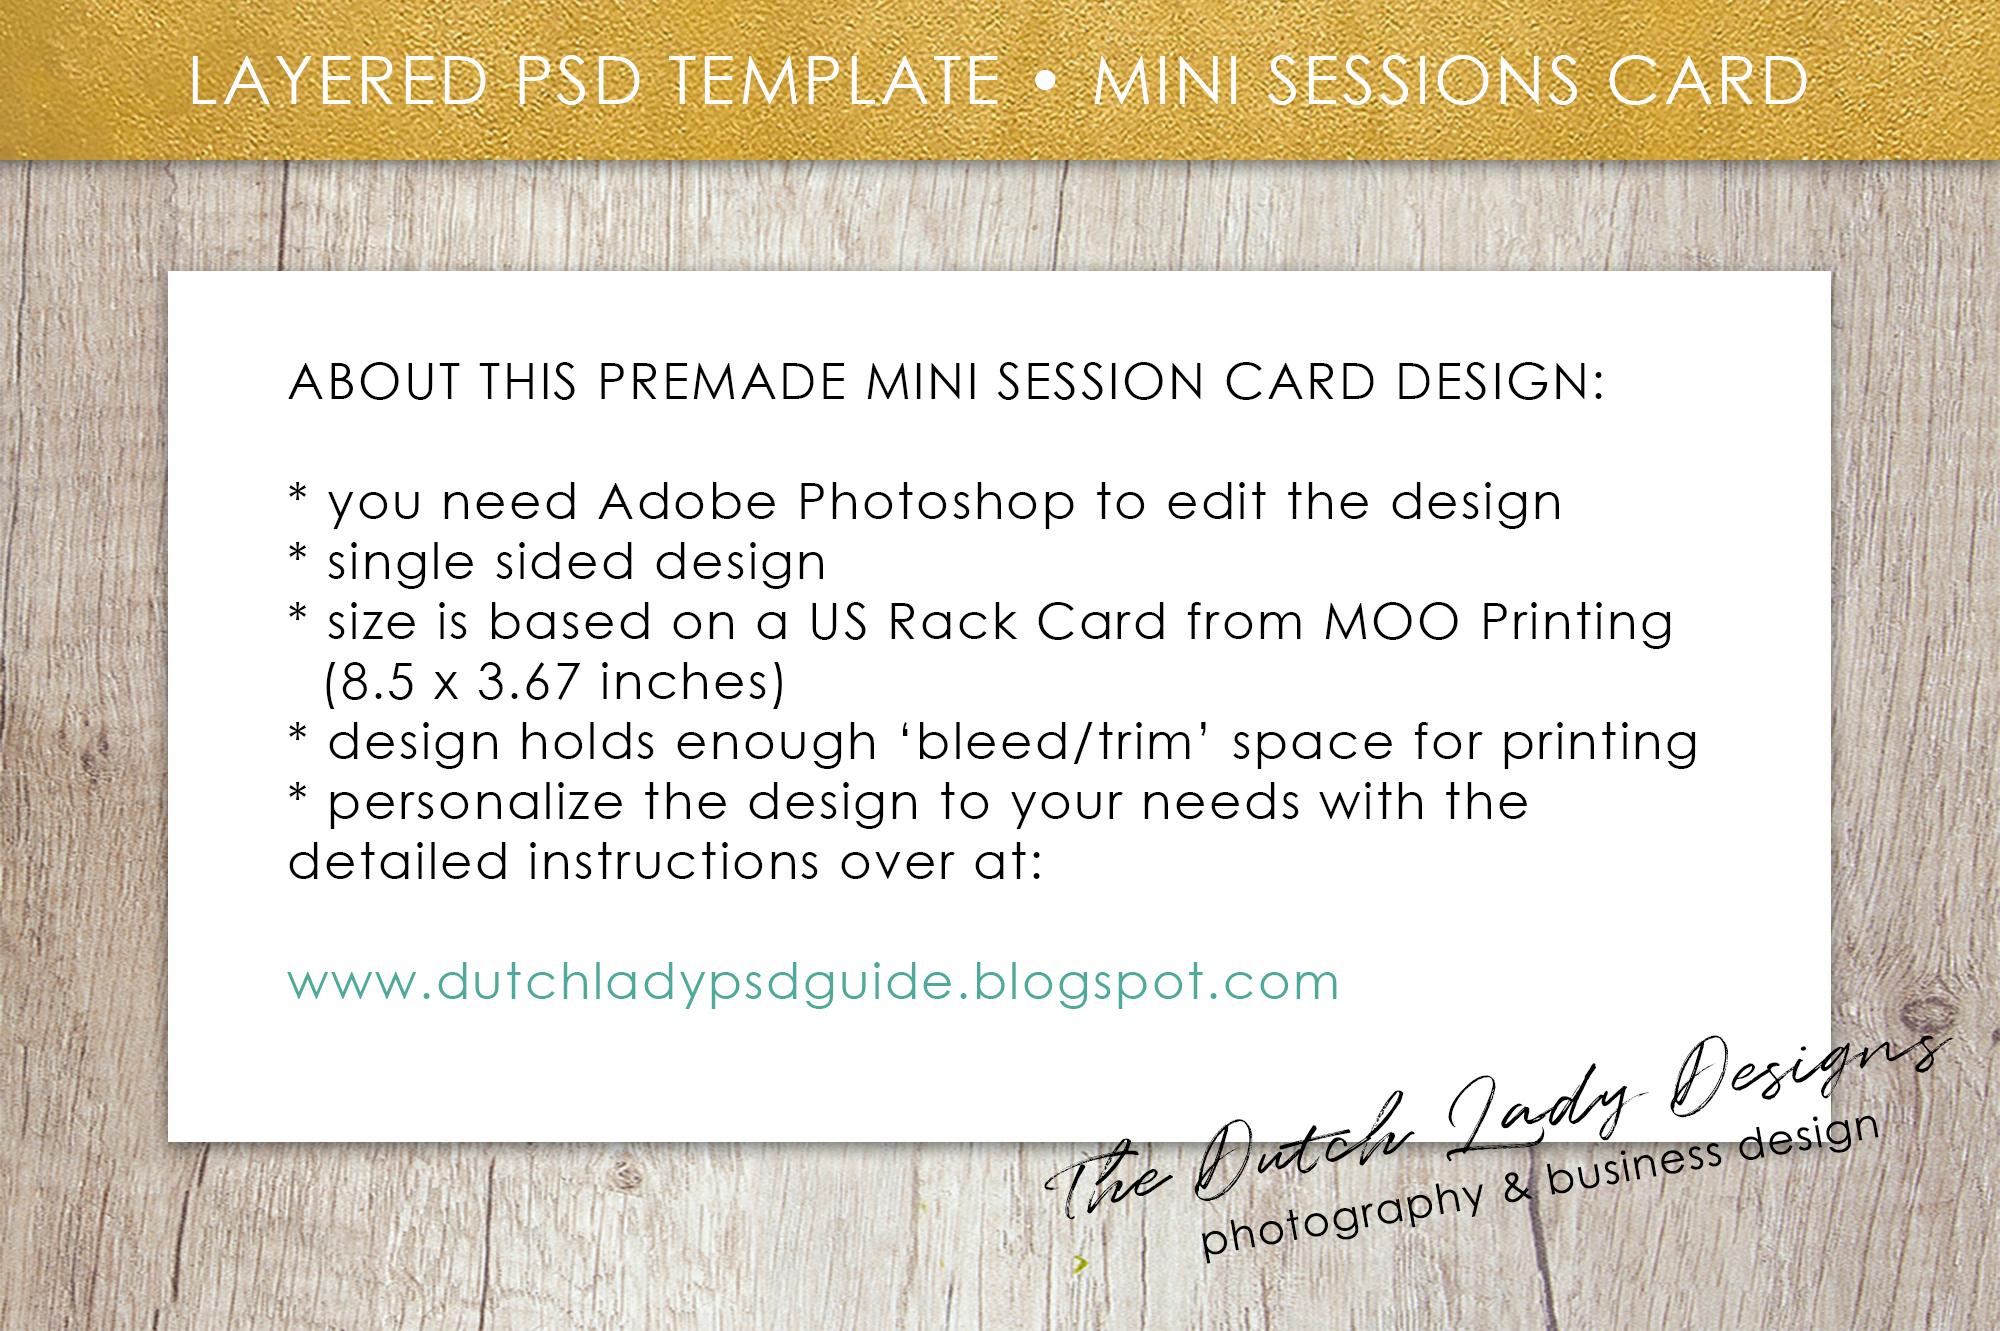 PSD Photo Mini Session Card Template - Design #24 example image 5